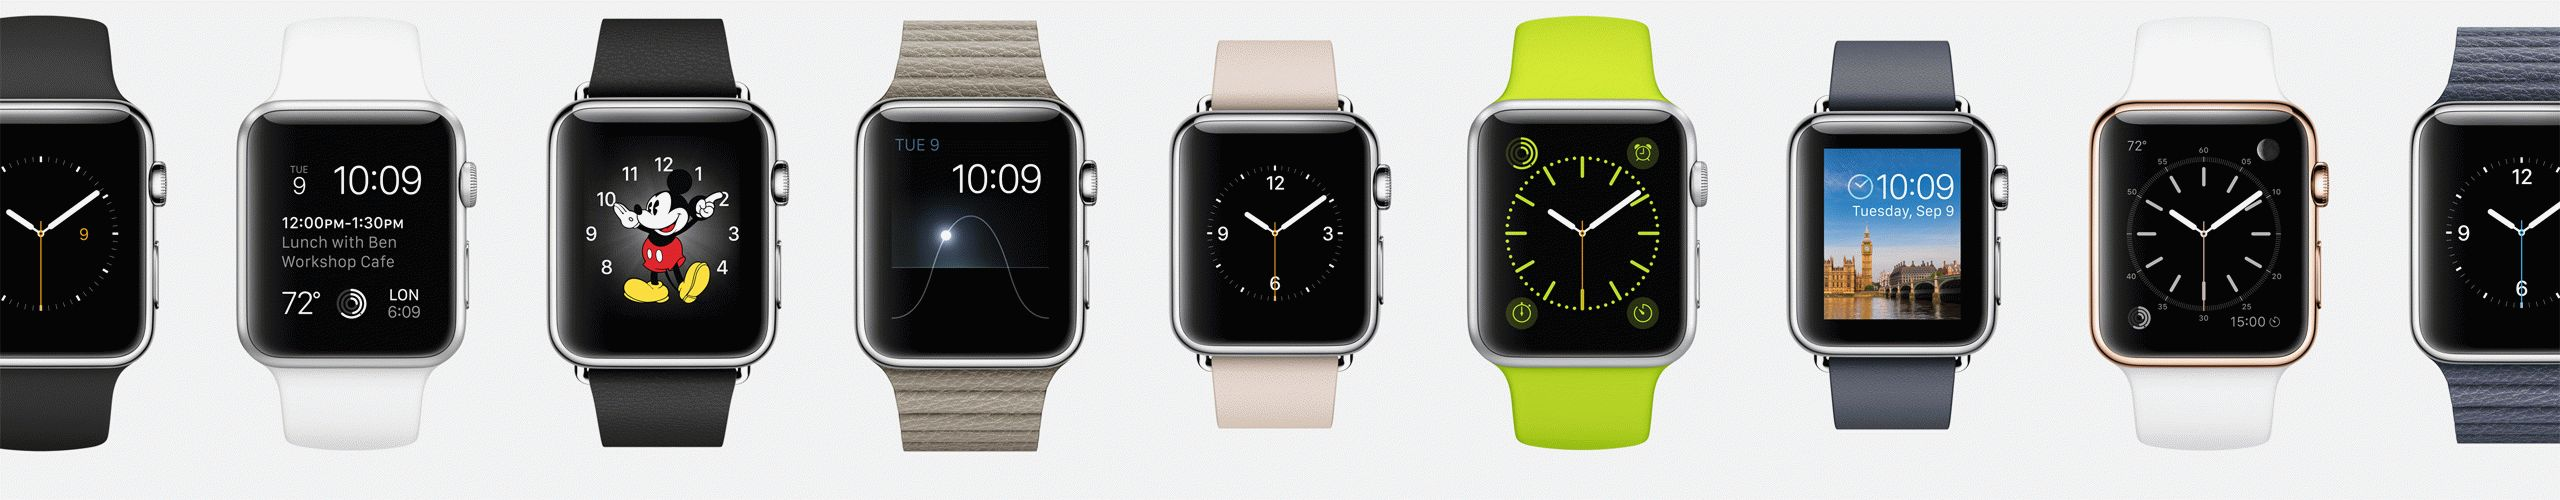 Apple-Watch-customizability_top